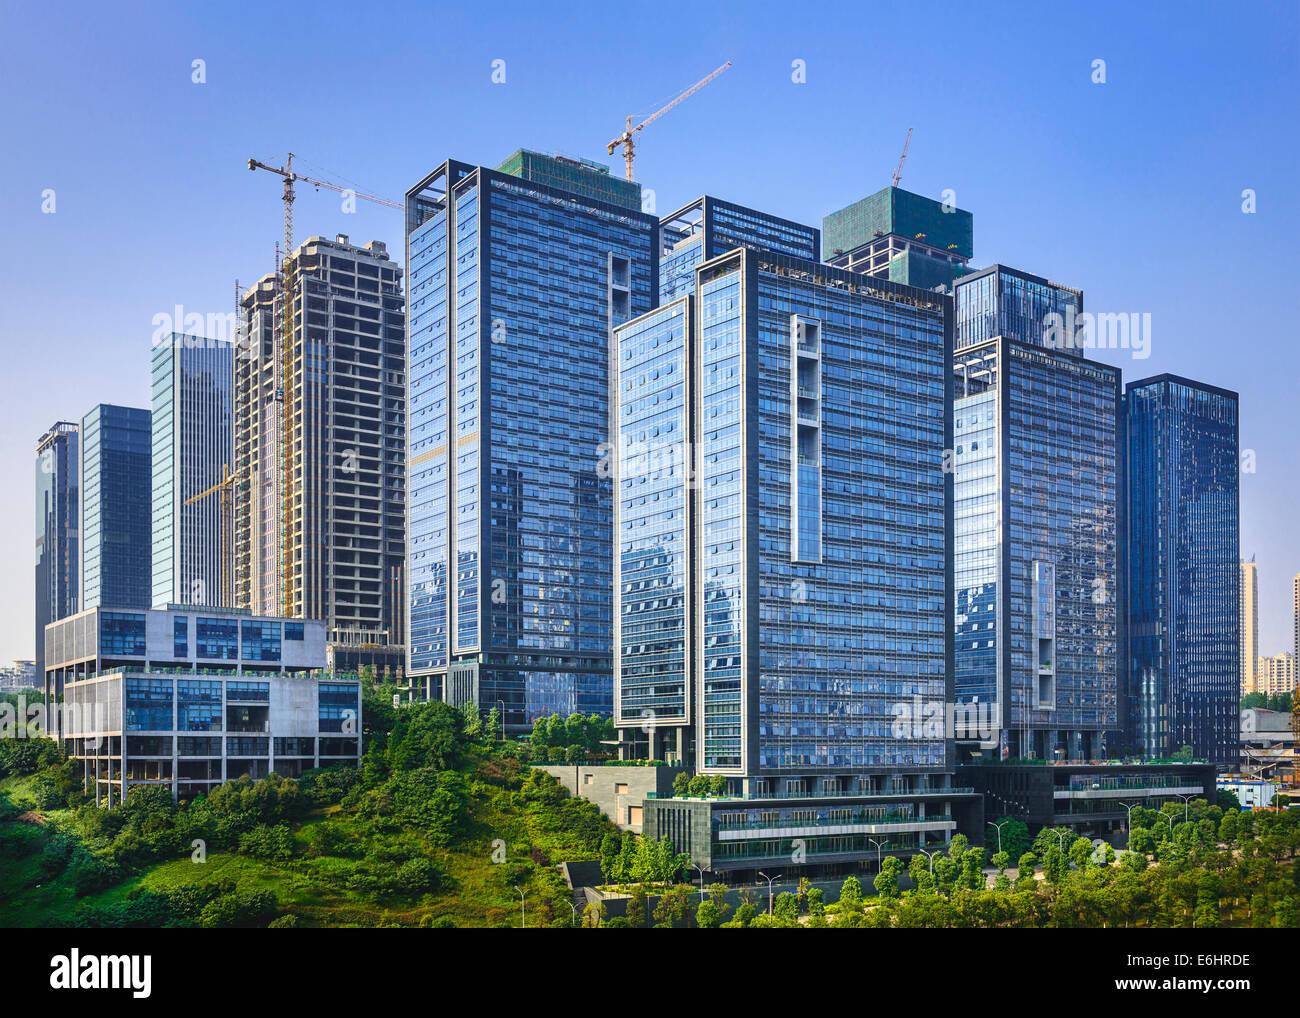 Moderne Bürogebäude, Neubau in Chongqing, China. Stockbild